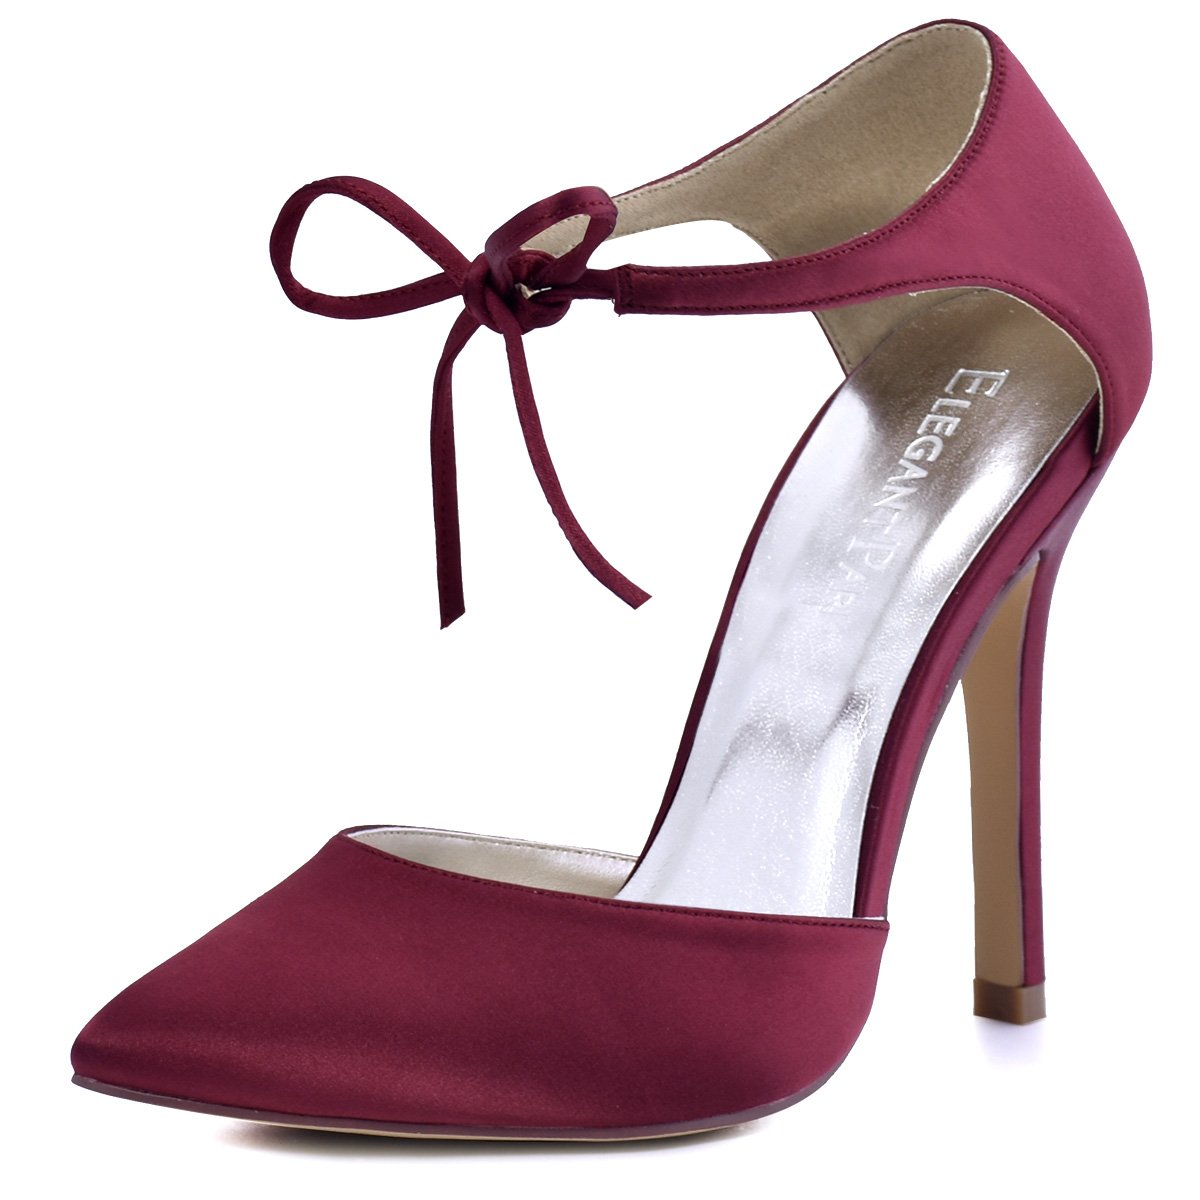 ElegantPark HC1610 Women's Pointed Toe High Heel Lace-up Bow D`Orsay Satin Dress Pumps Burgundy US 9